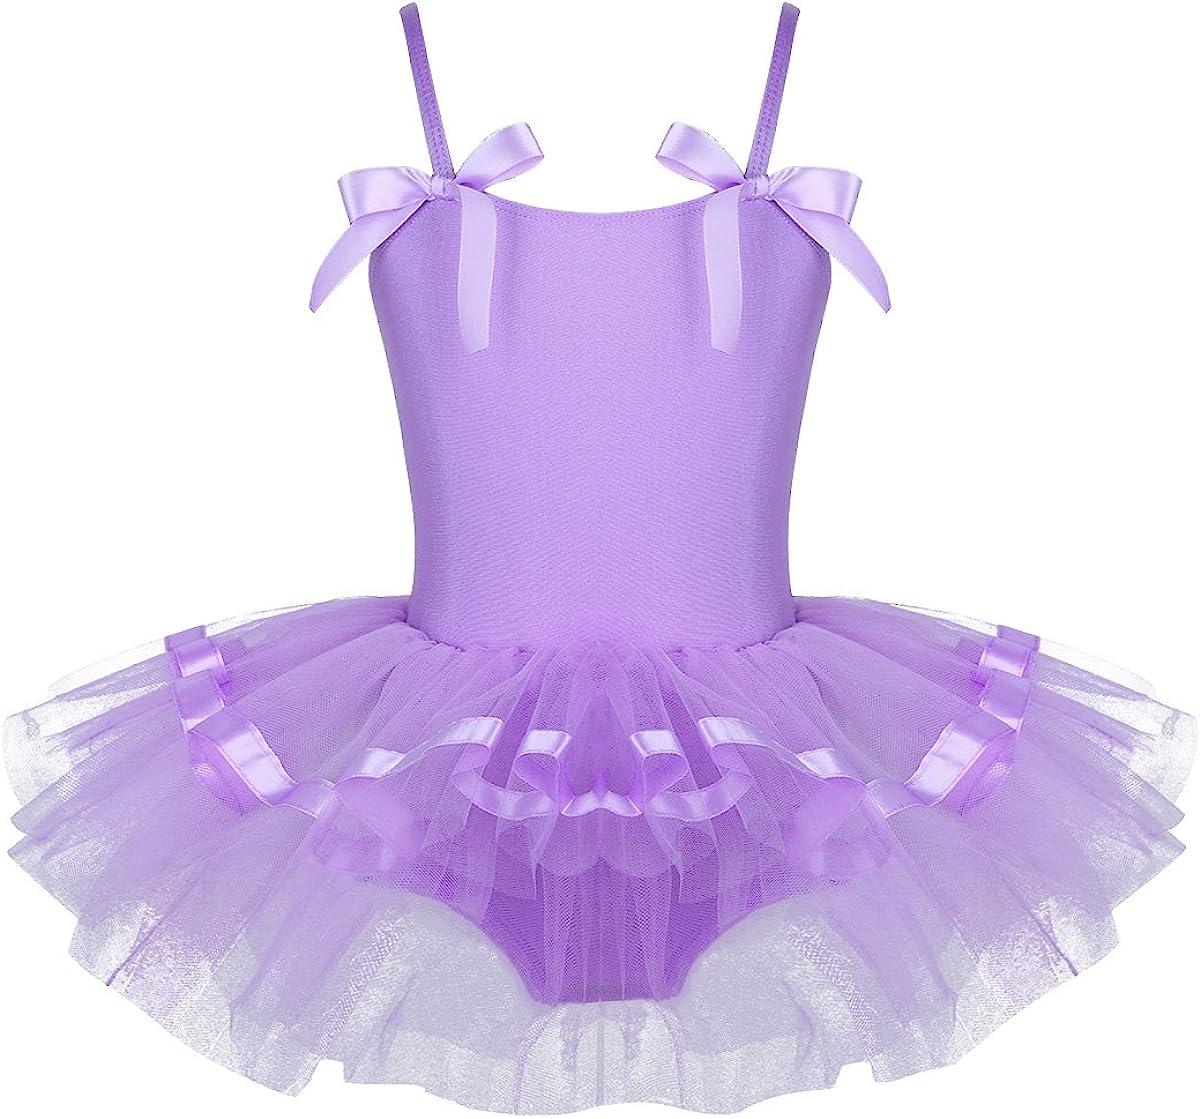 Freebily Girls Spaghetti Shoulder Ballet Leotard Princess Dancing Tutu Dress Gymnastics Dancewear